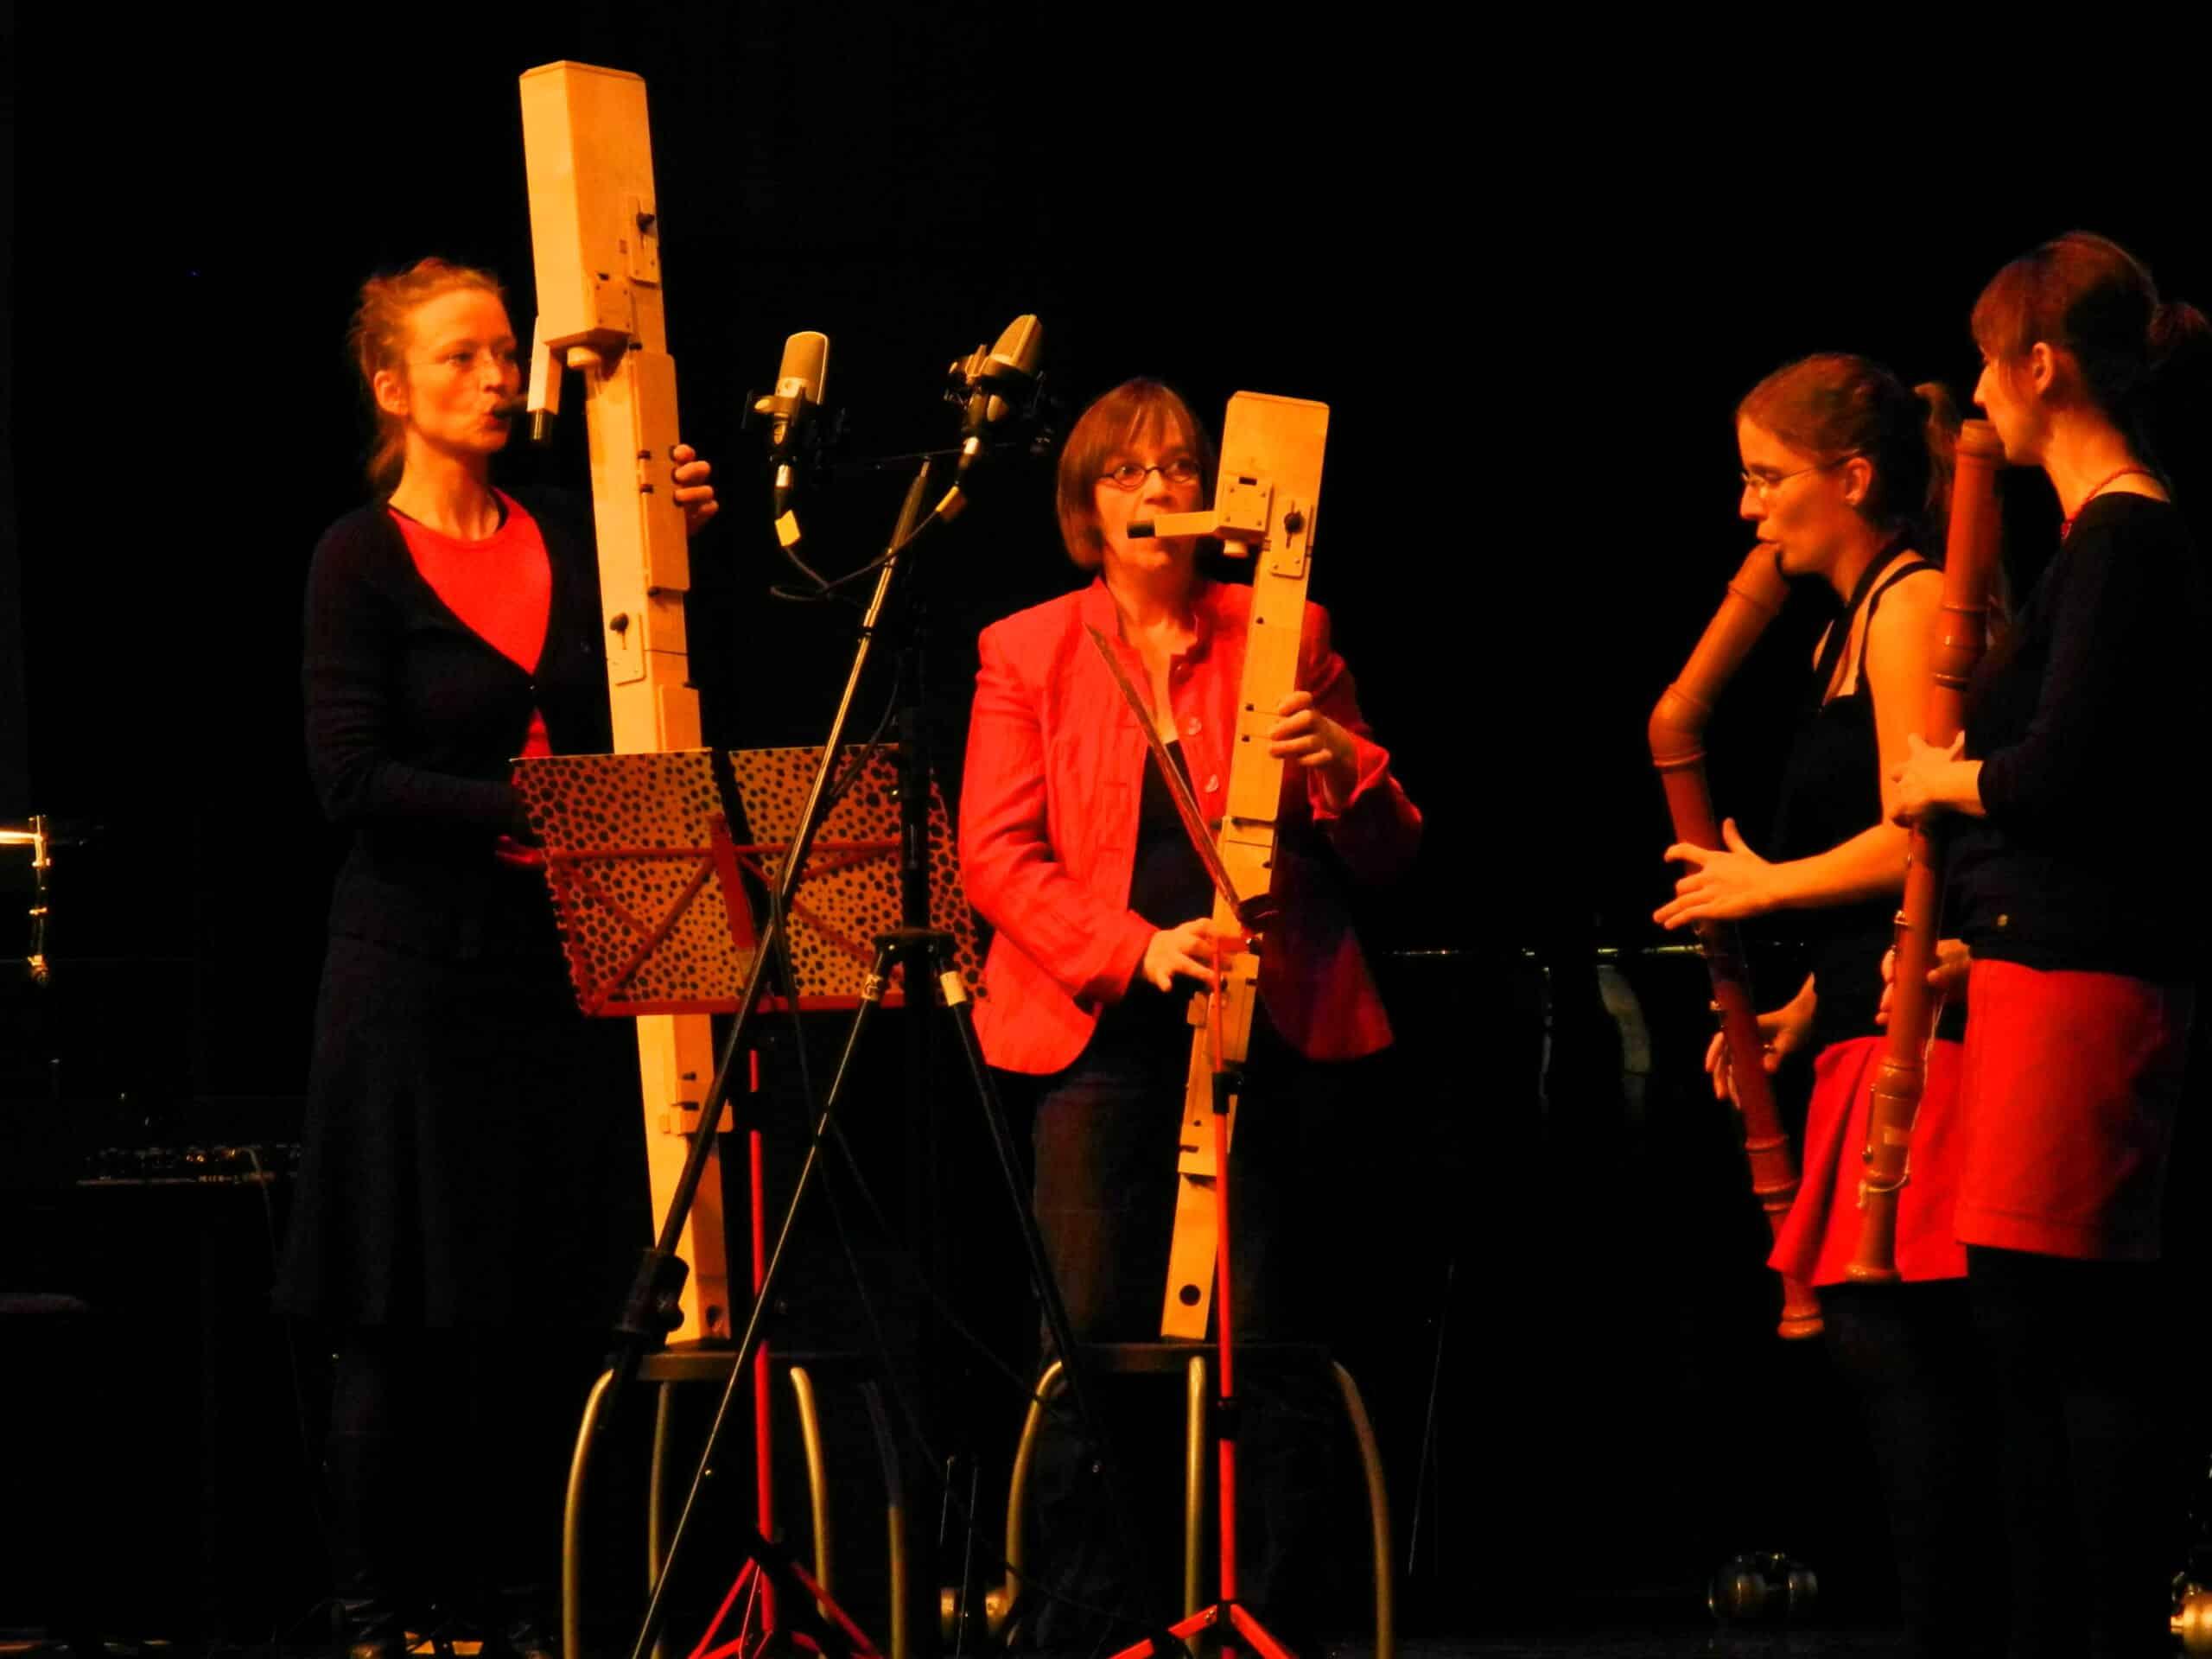 Ensemble Saltarello u Paetzold Bässe